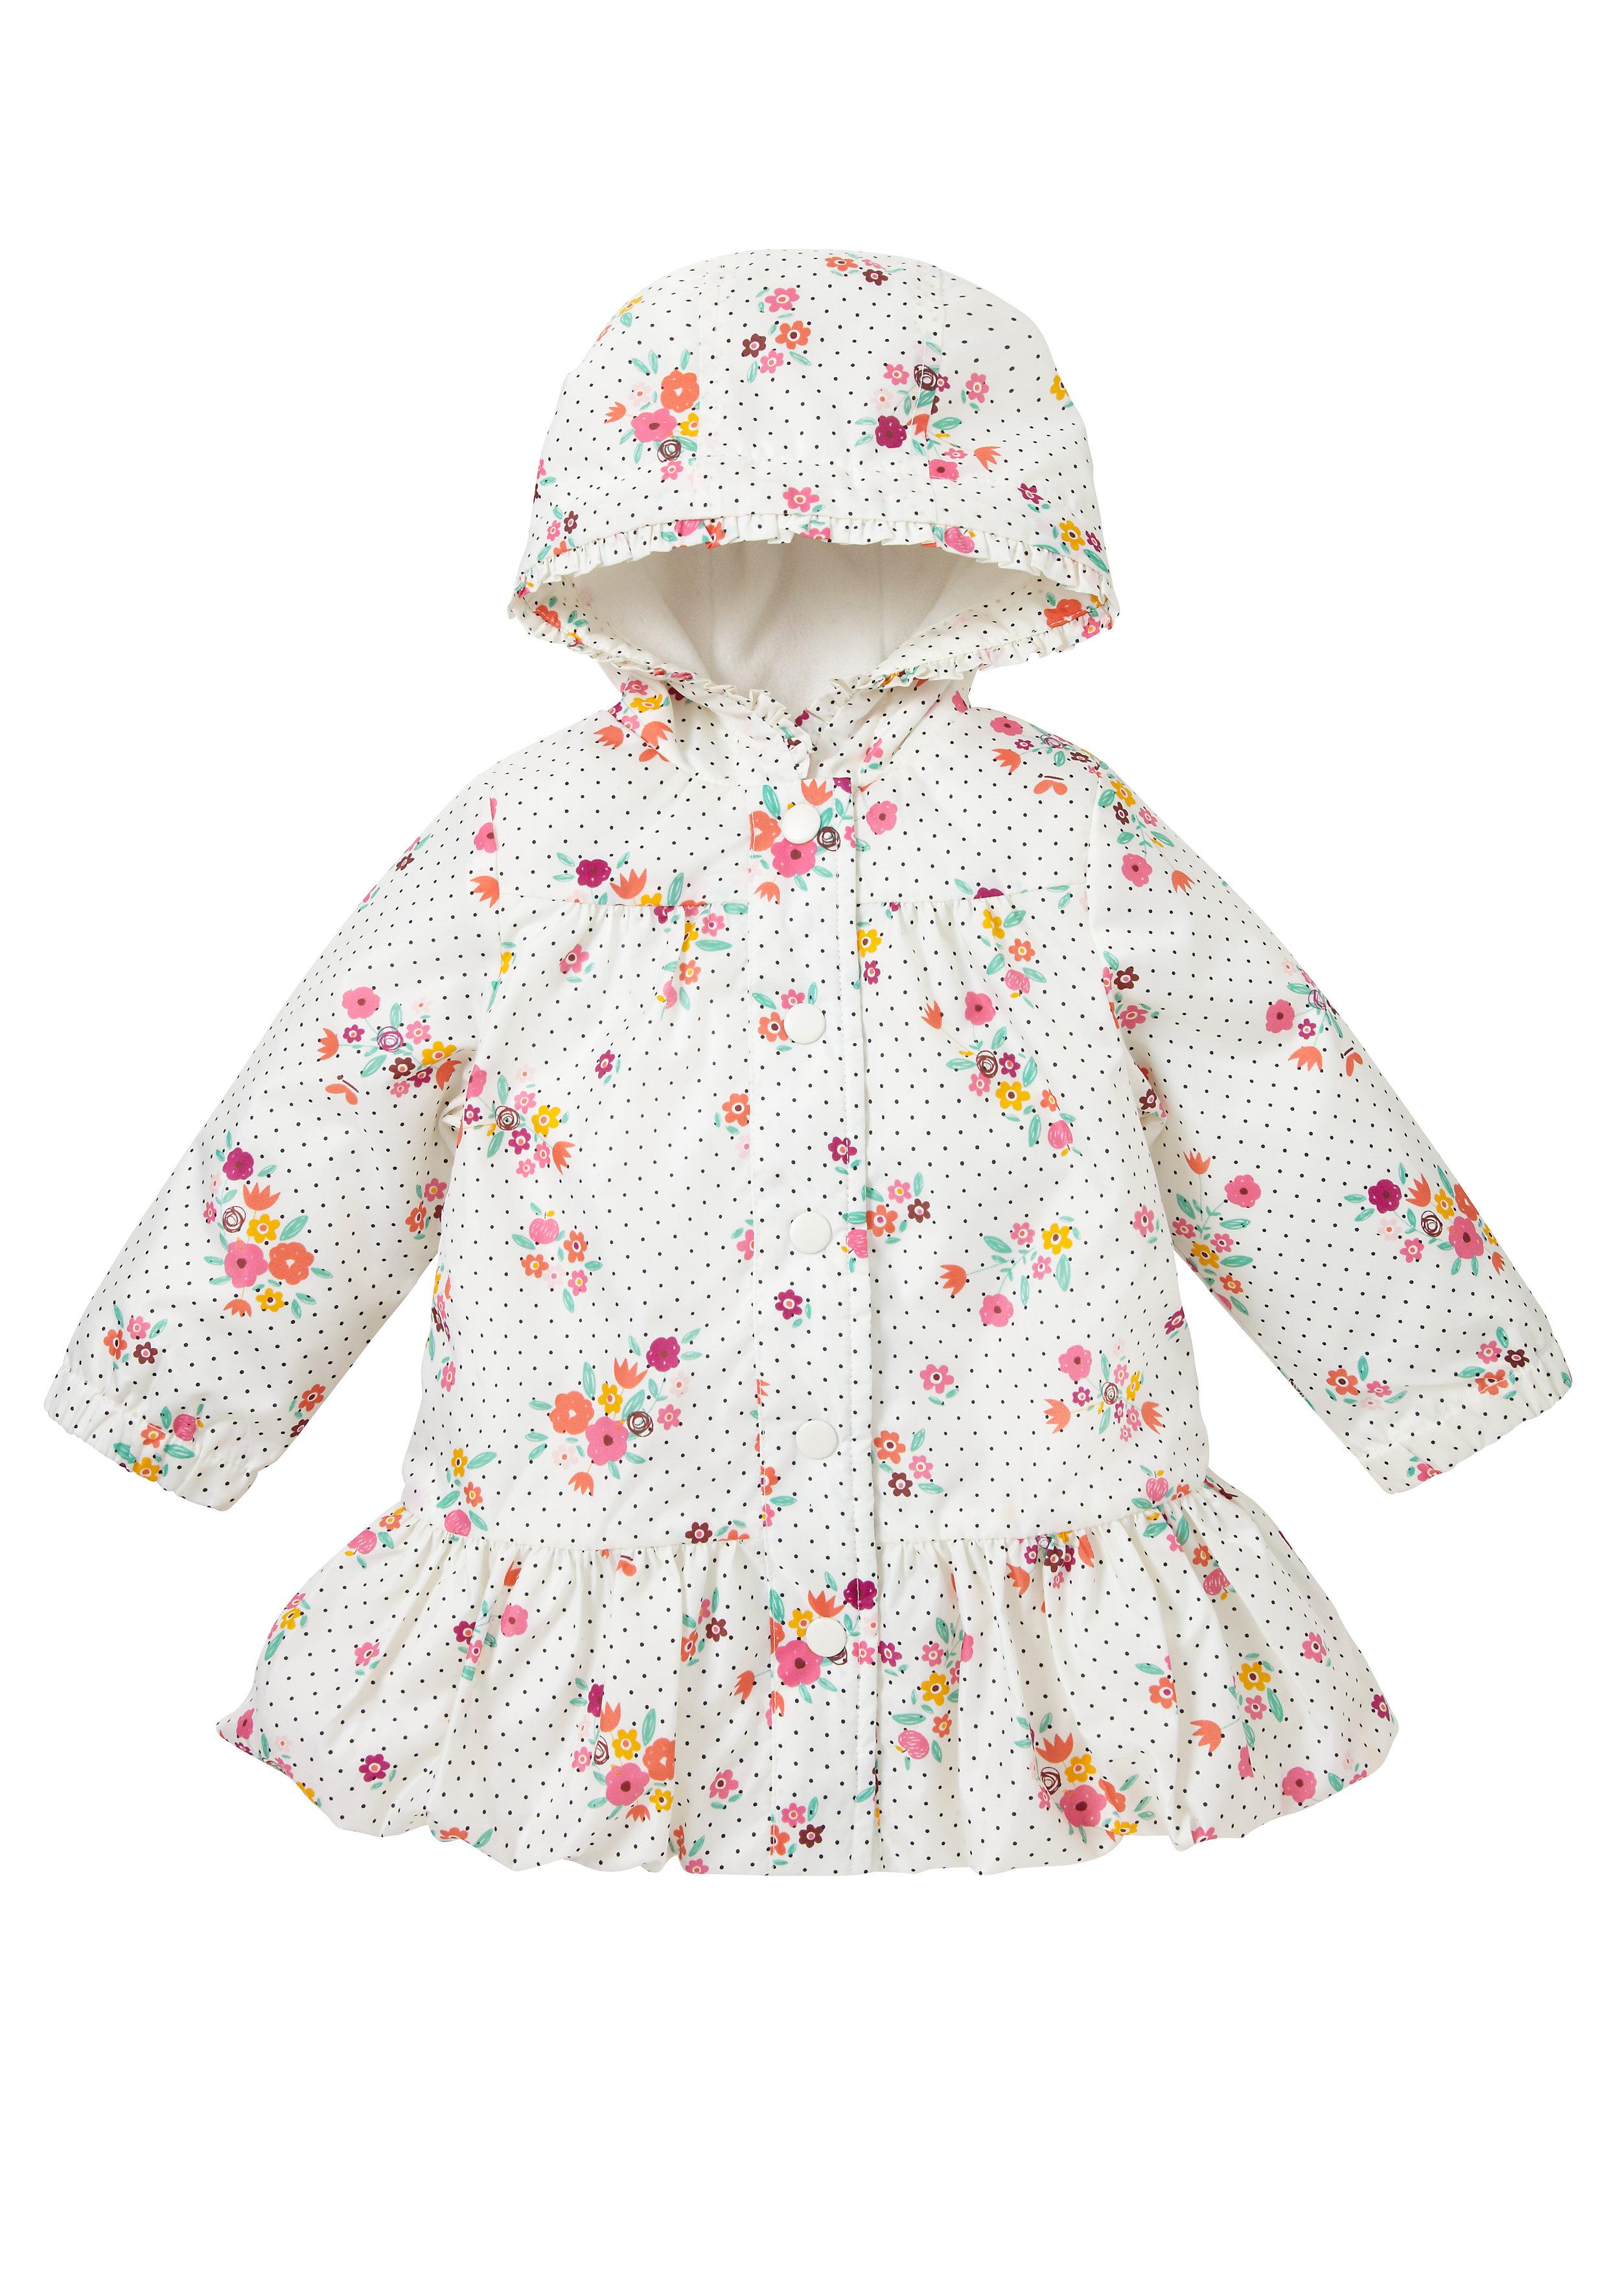 Mothercare   Girls Floral Mac - Cream